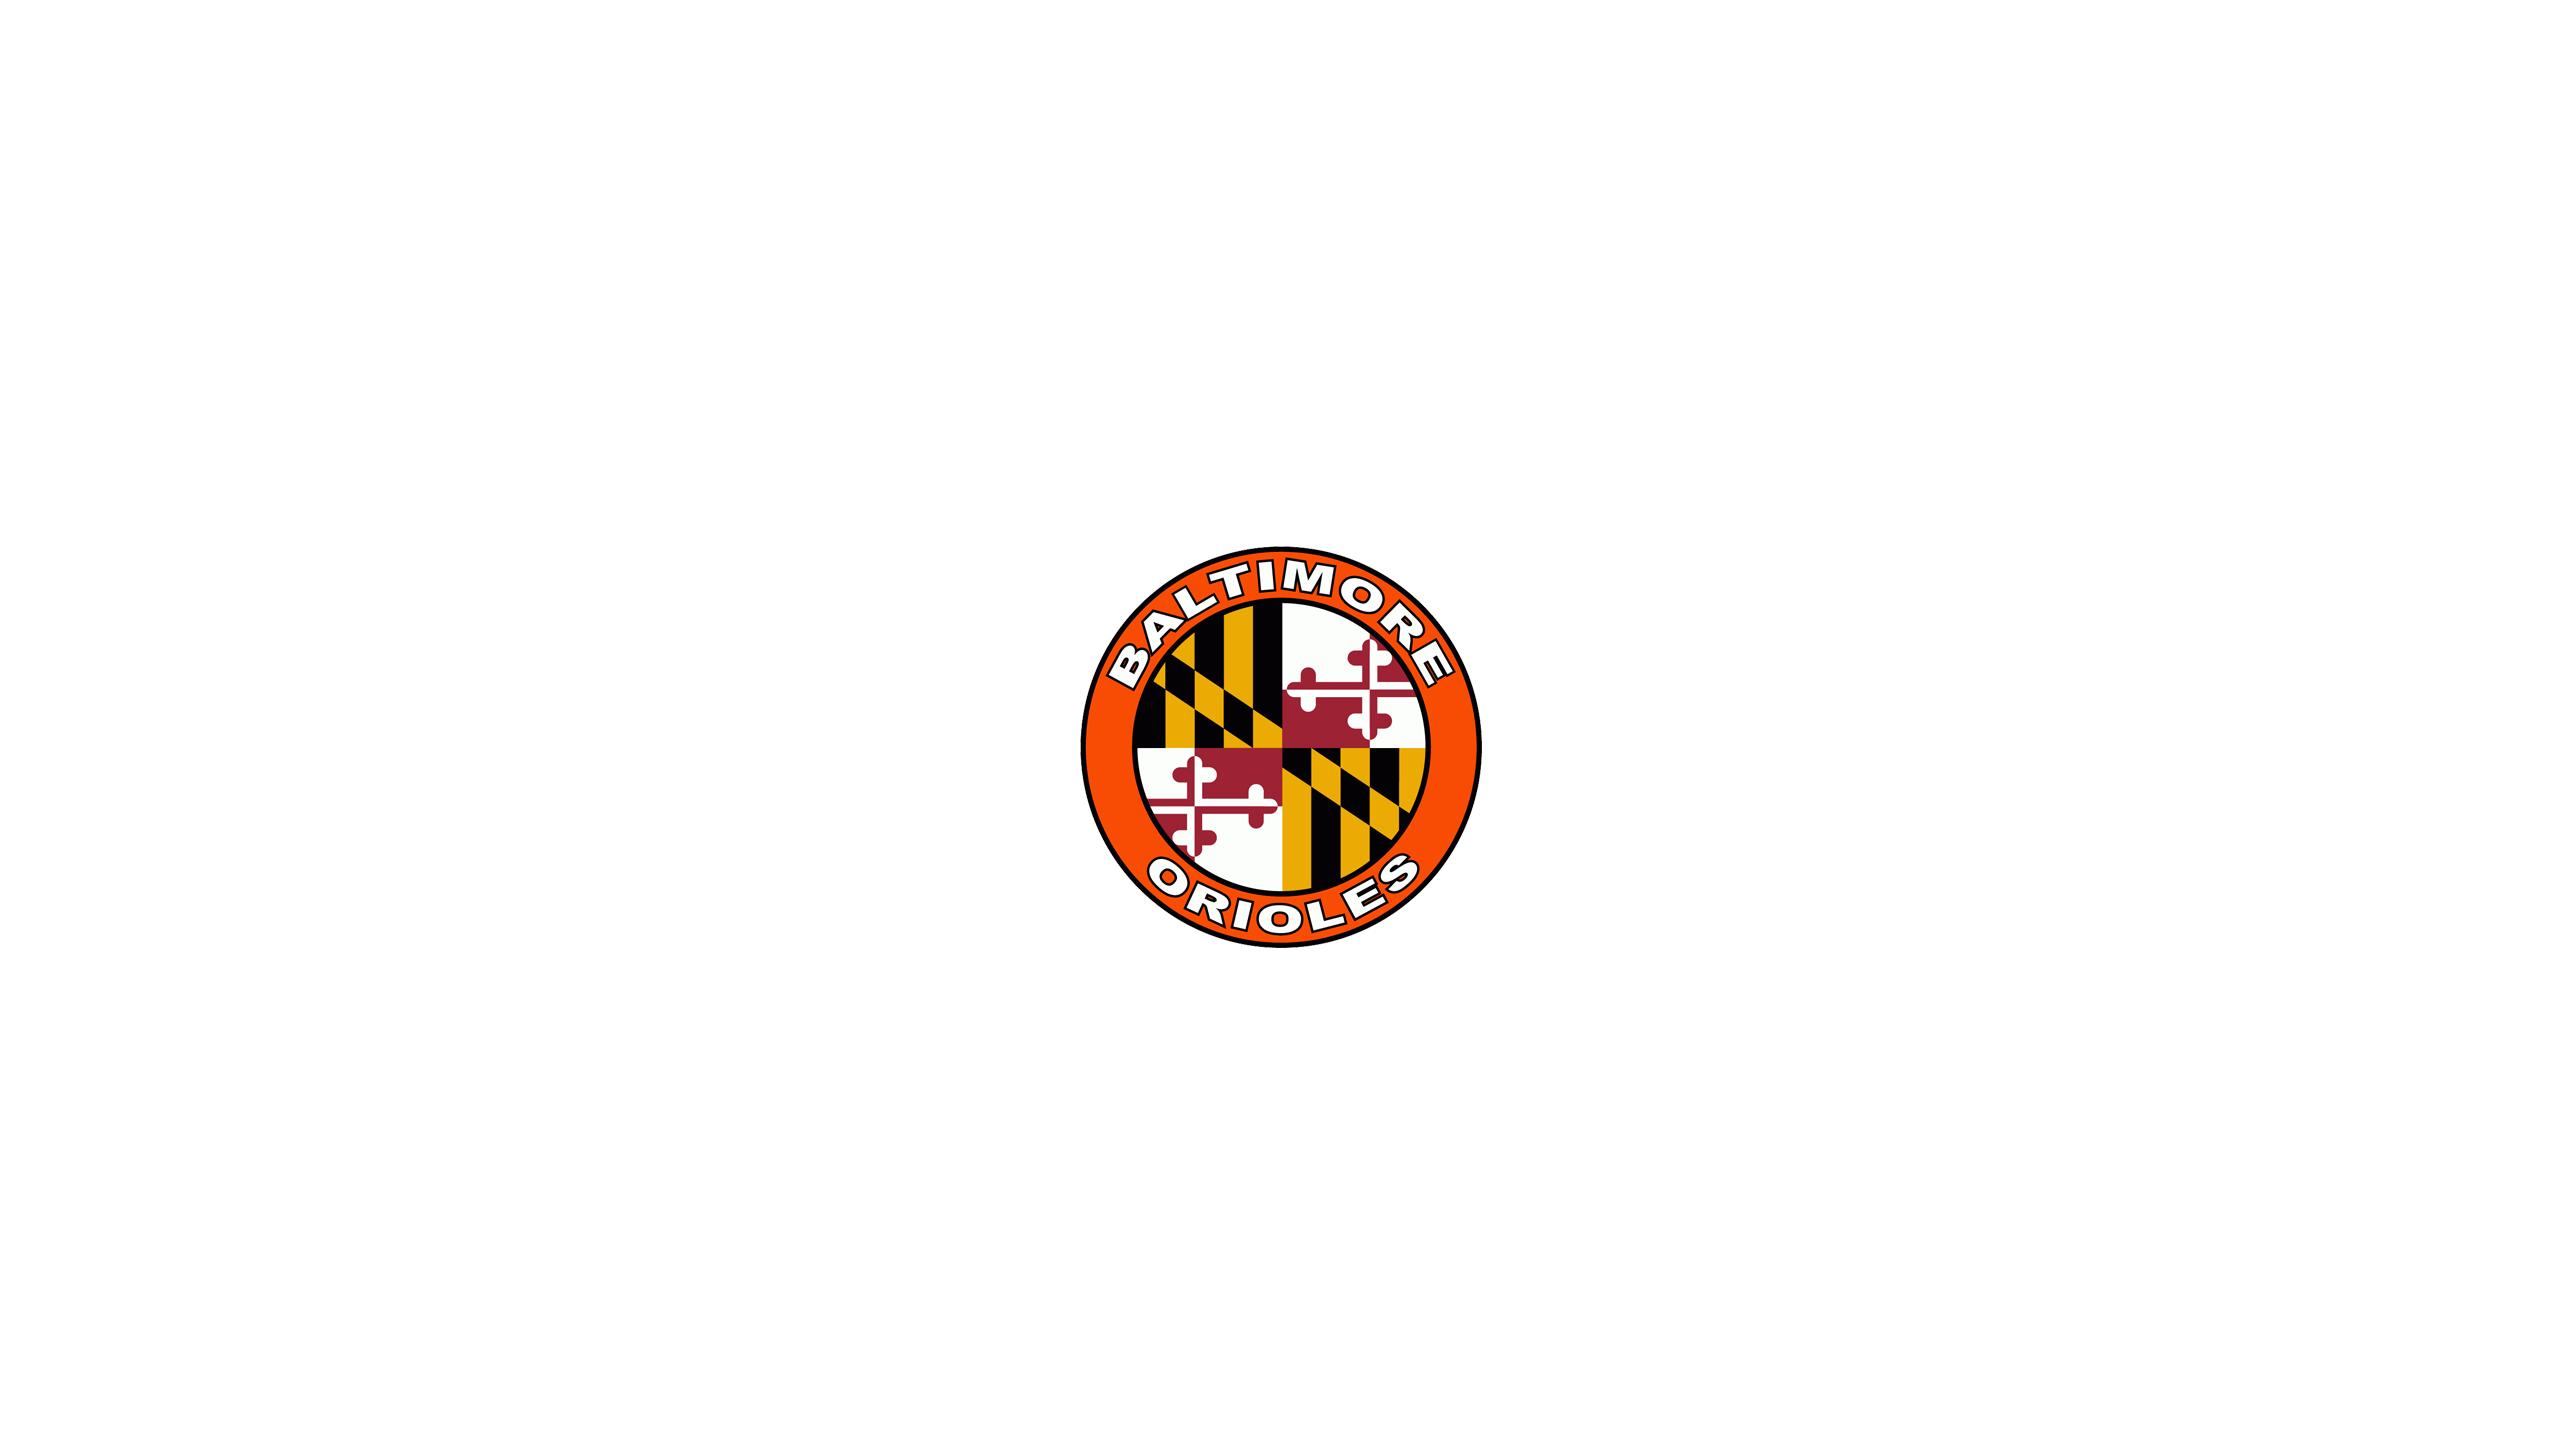 Baltimore Orioles (Alt Flag)